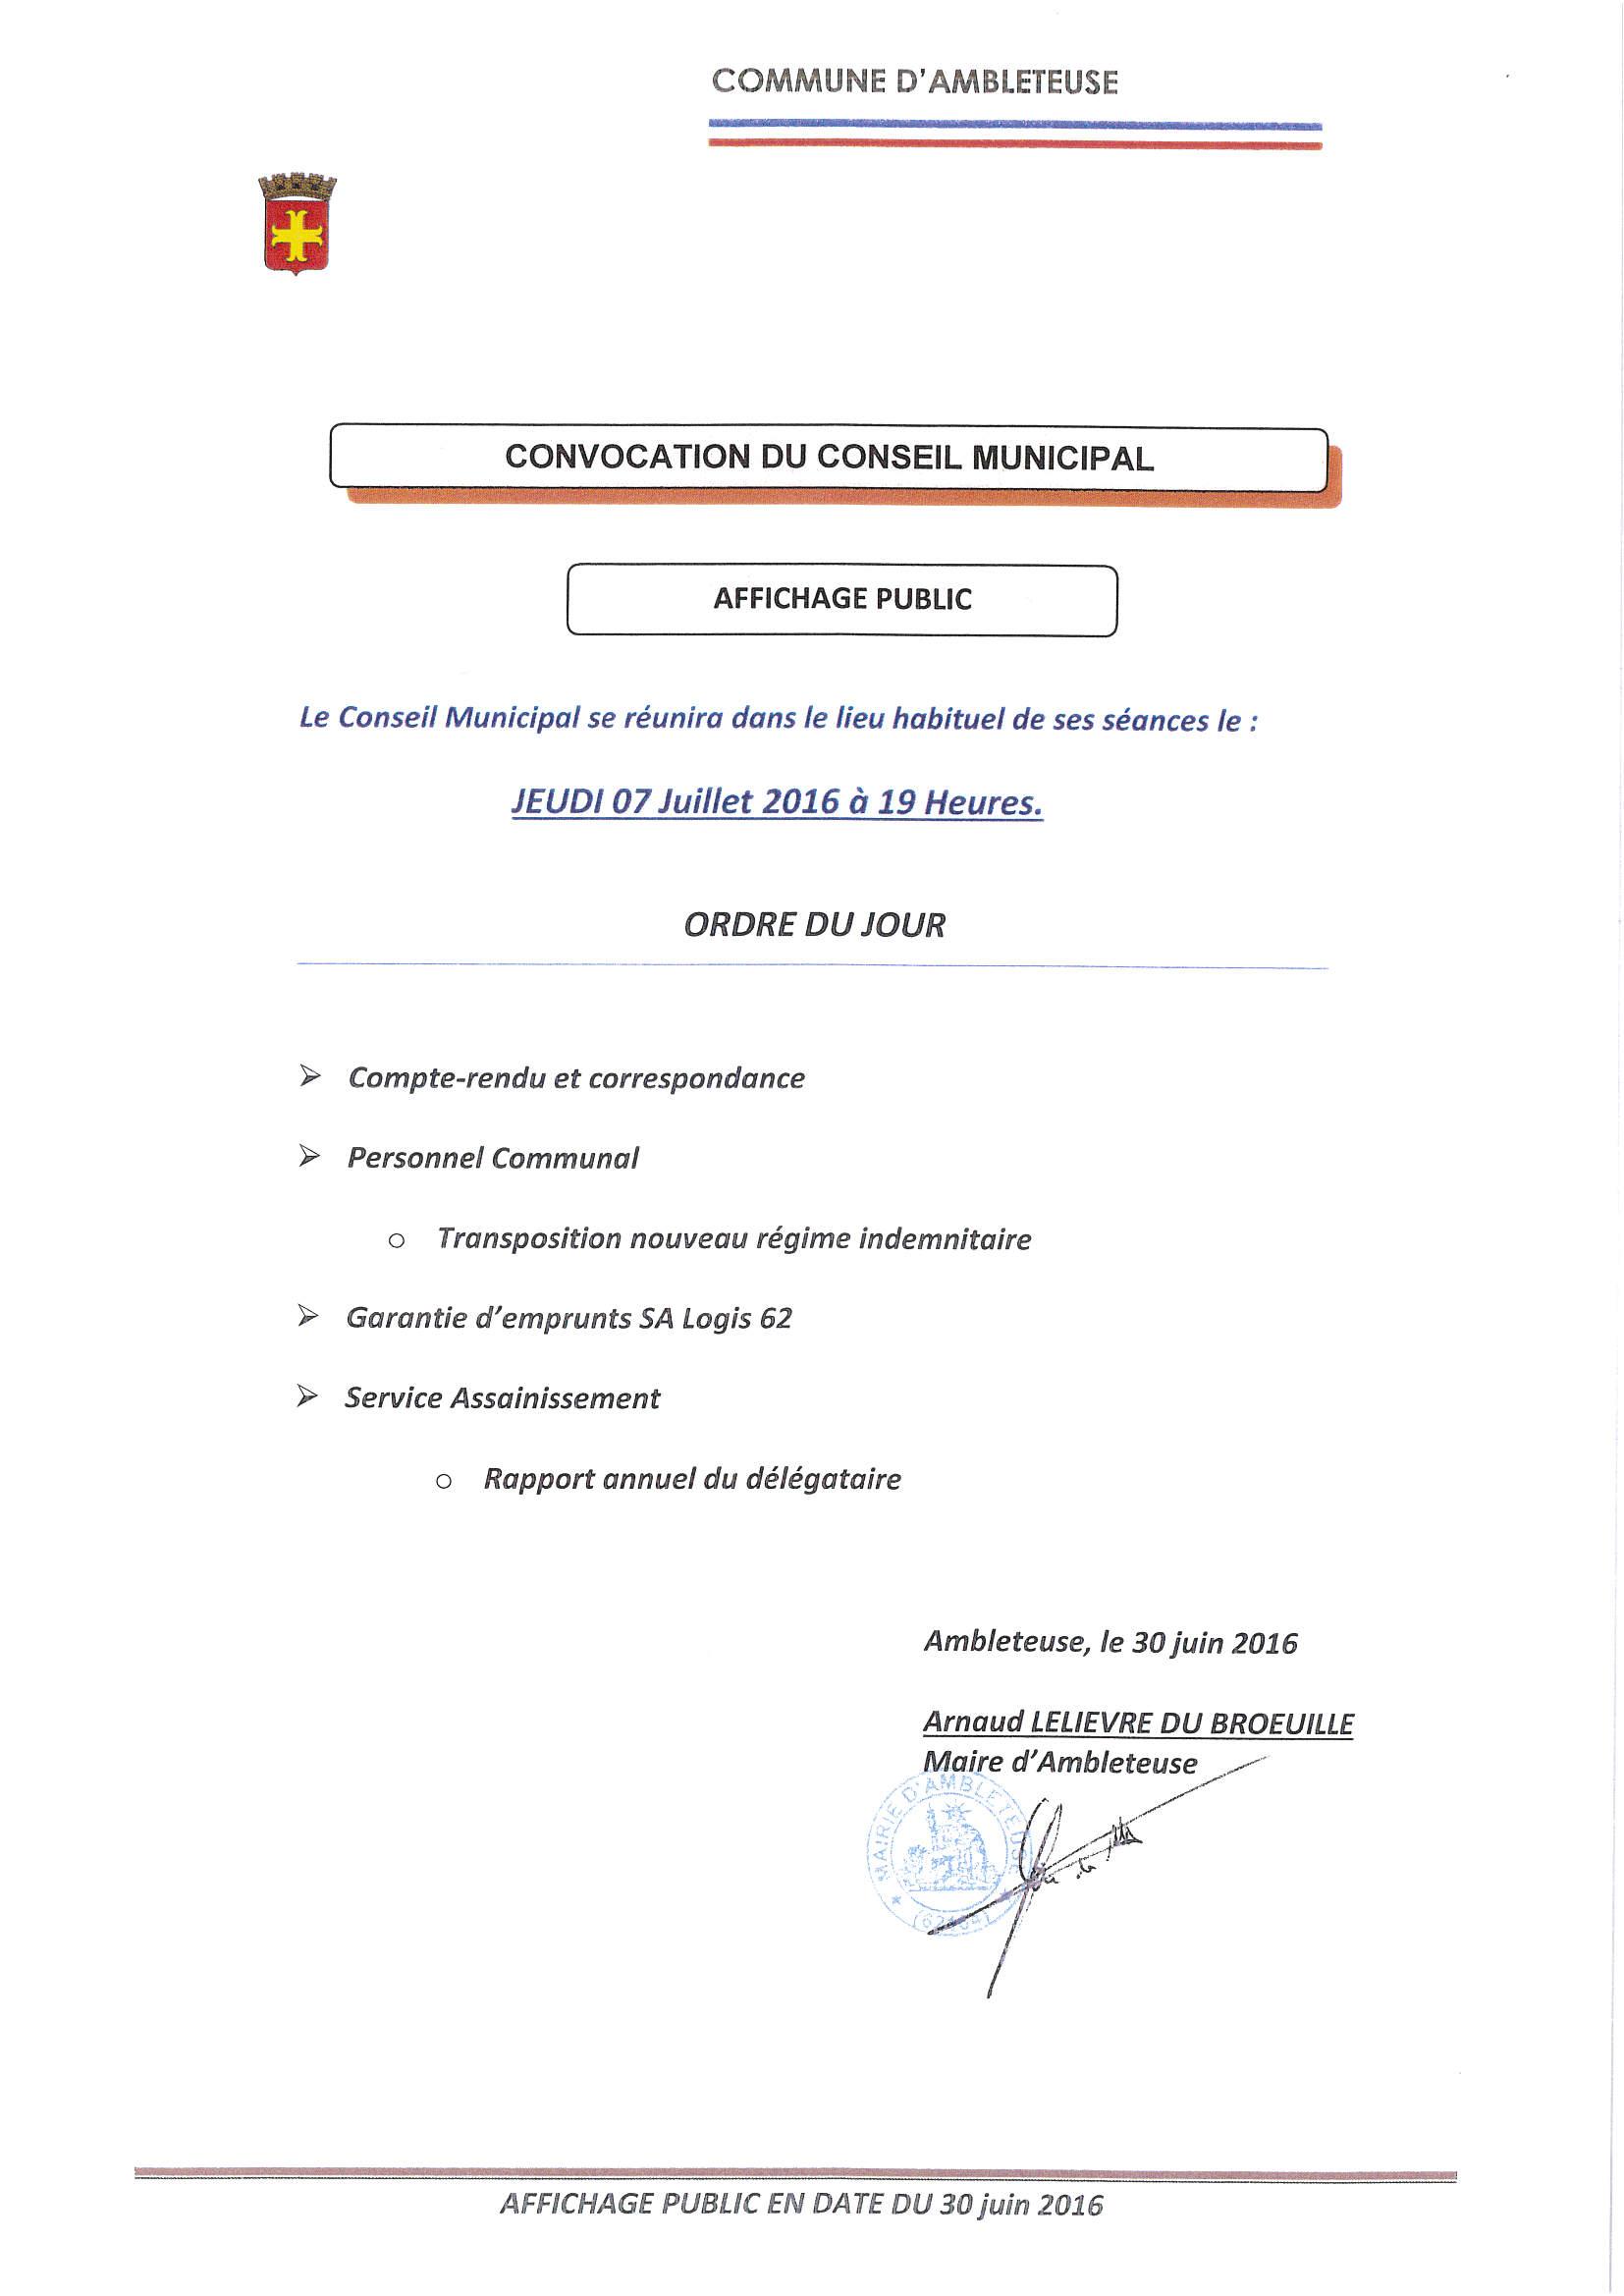 conseil municipal_001.jpg